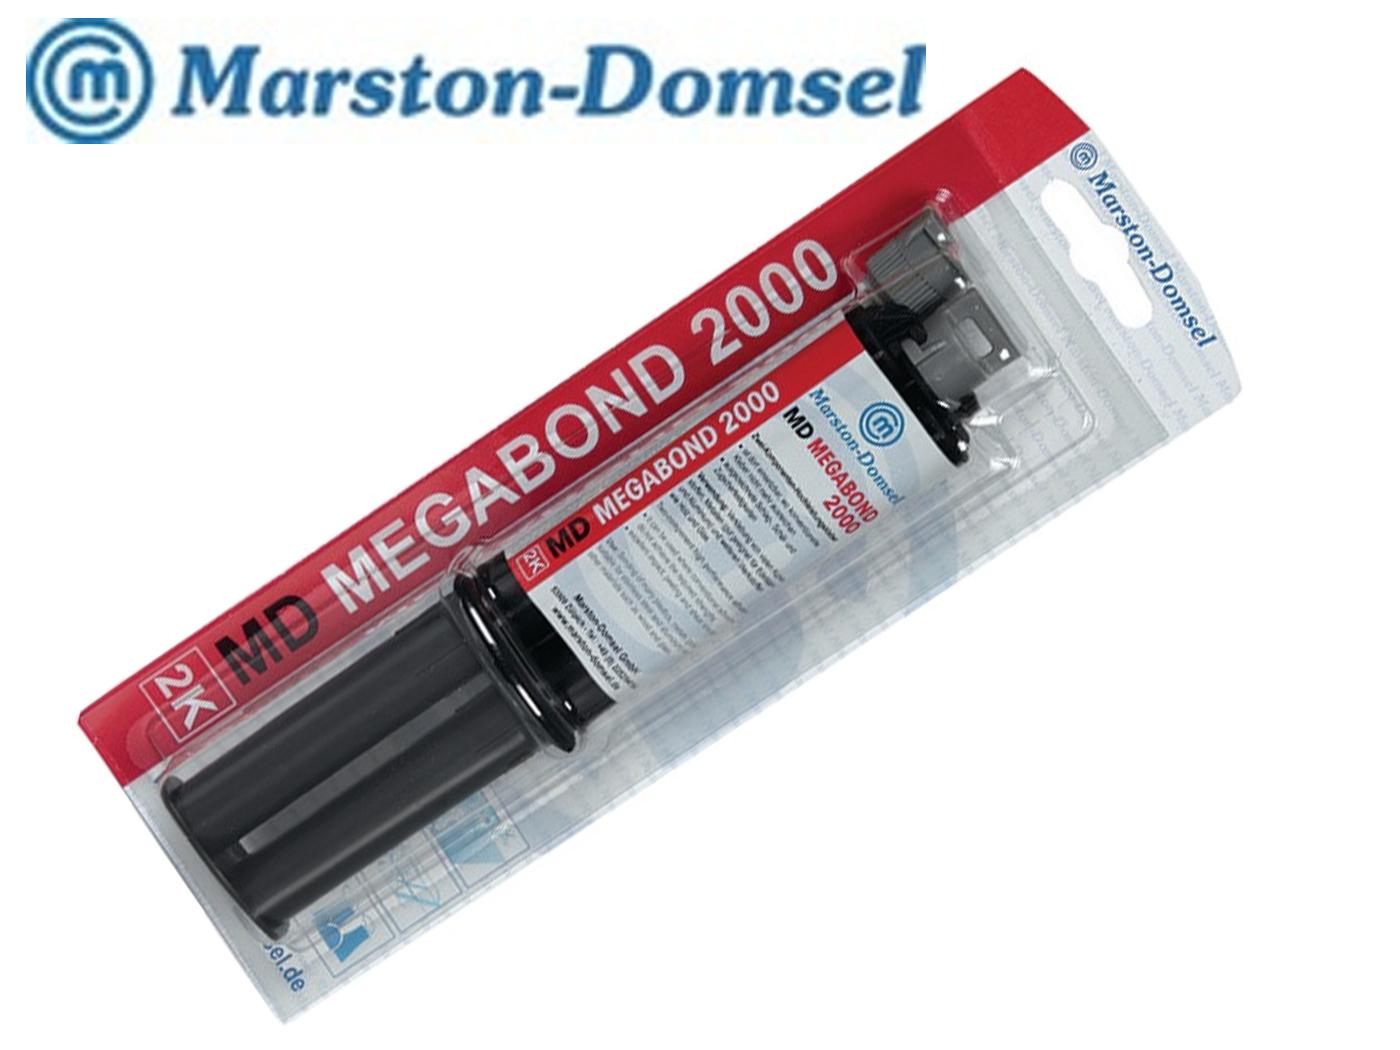 2-componenten high-performance lijm MD-Megabond | DKMTools - DKM Tools